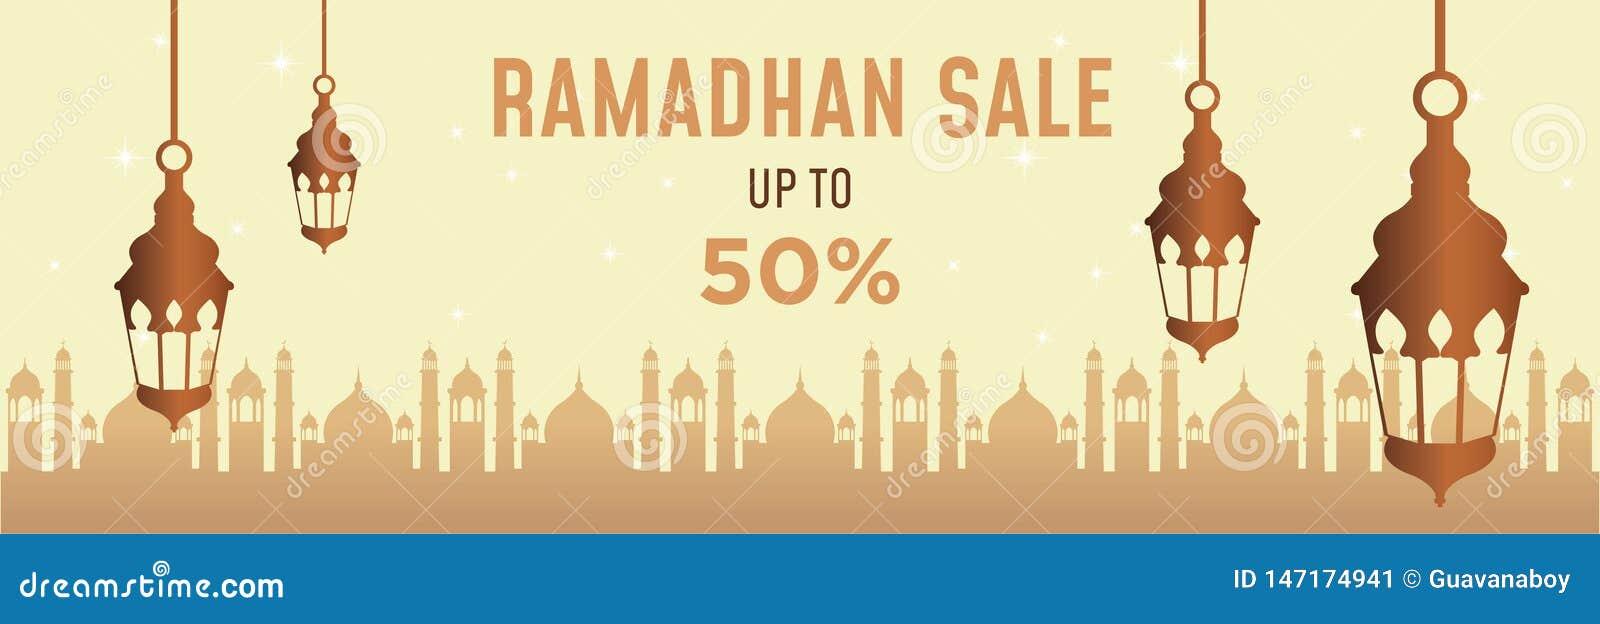 Ramadan header banner